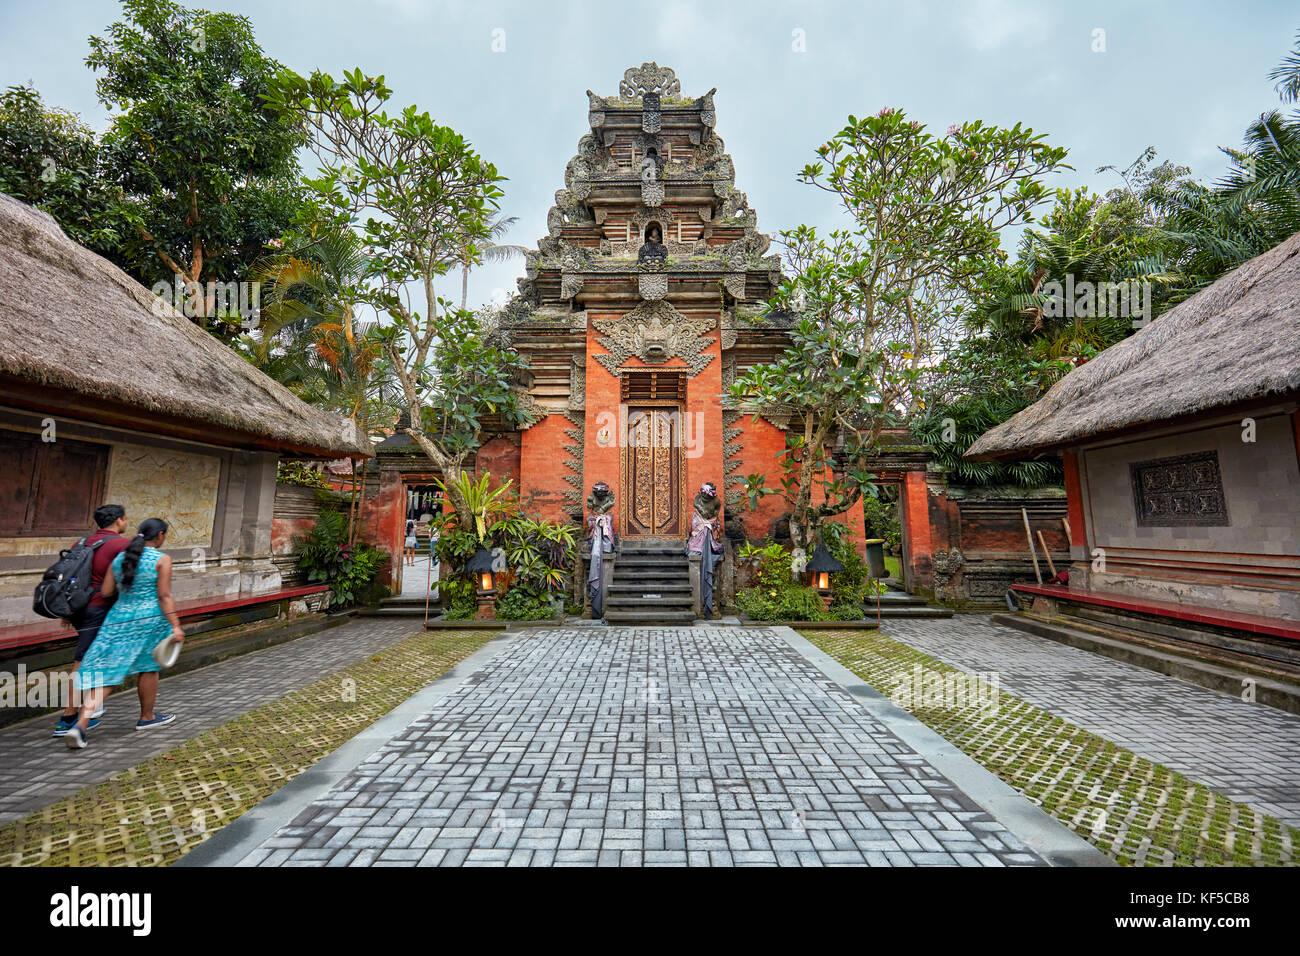 Puri Saren Agung, also known as Ubud Palace at dusk. Ubud, Bali, Indonesia. - Stock Image